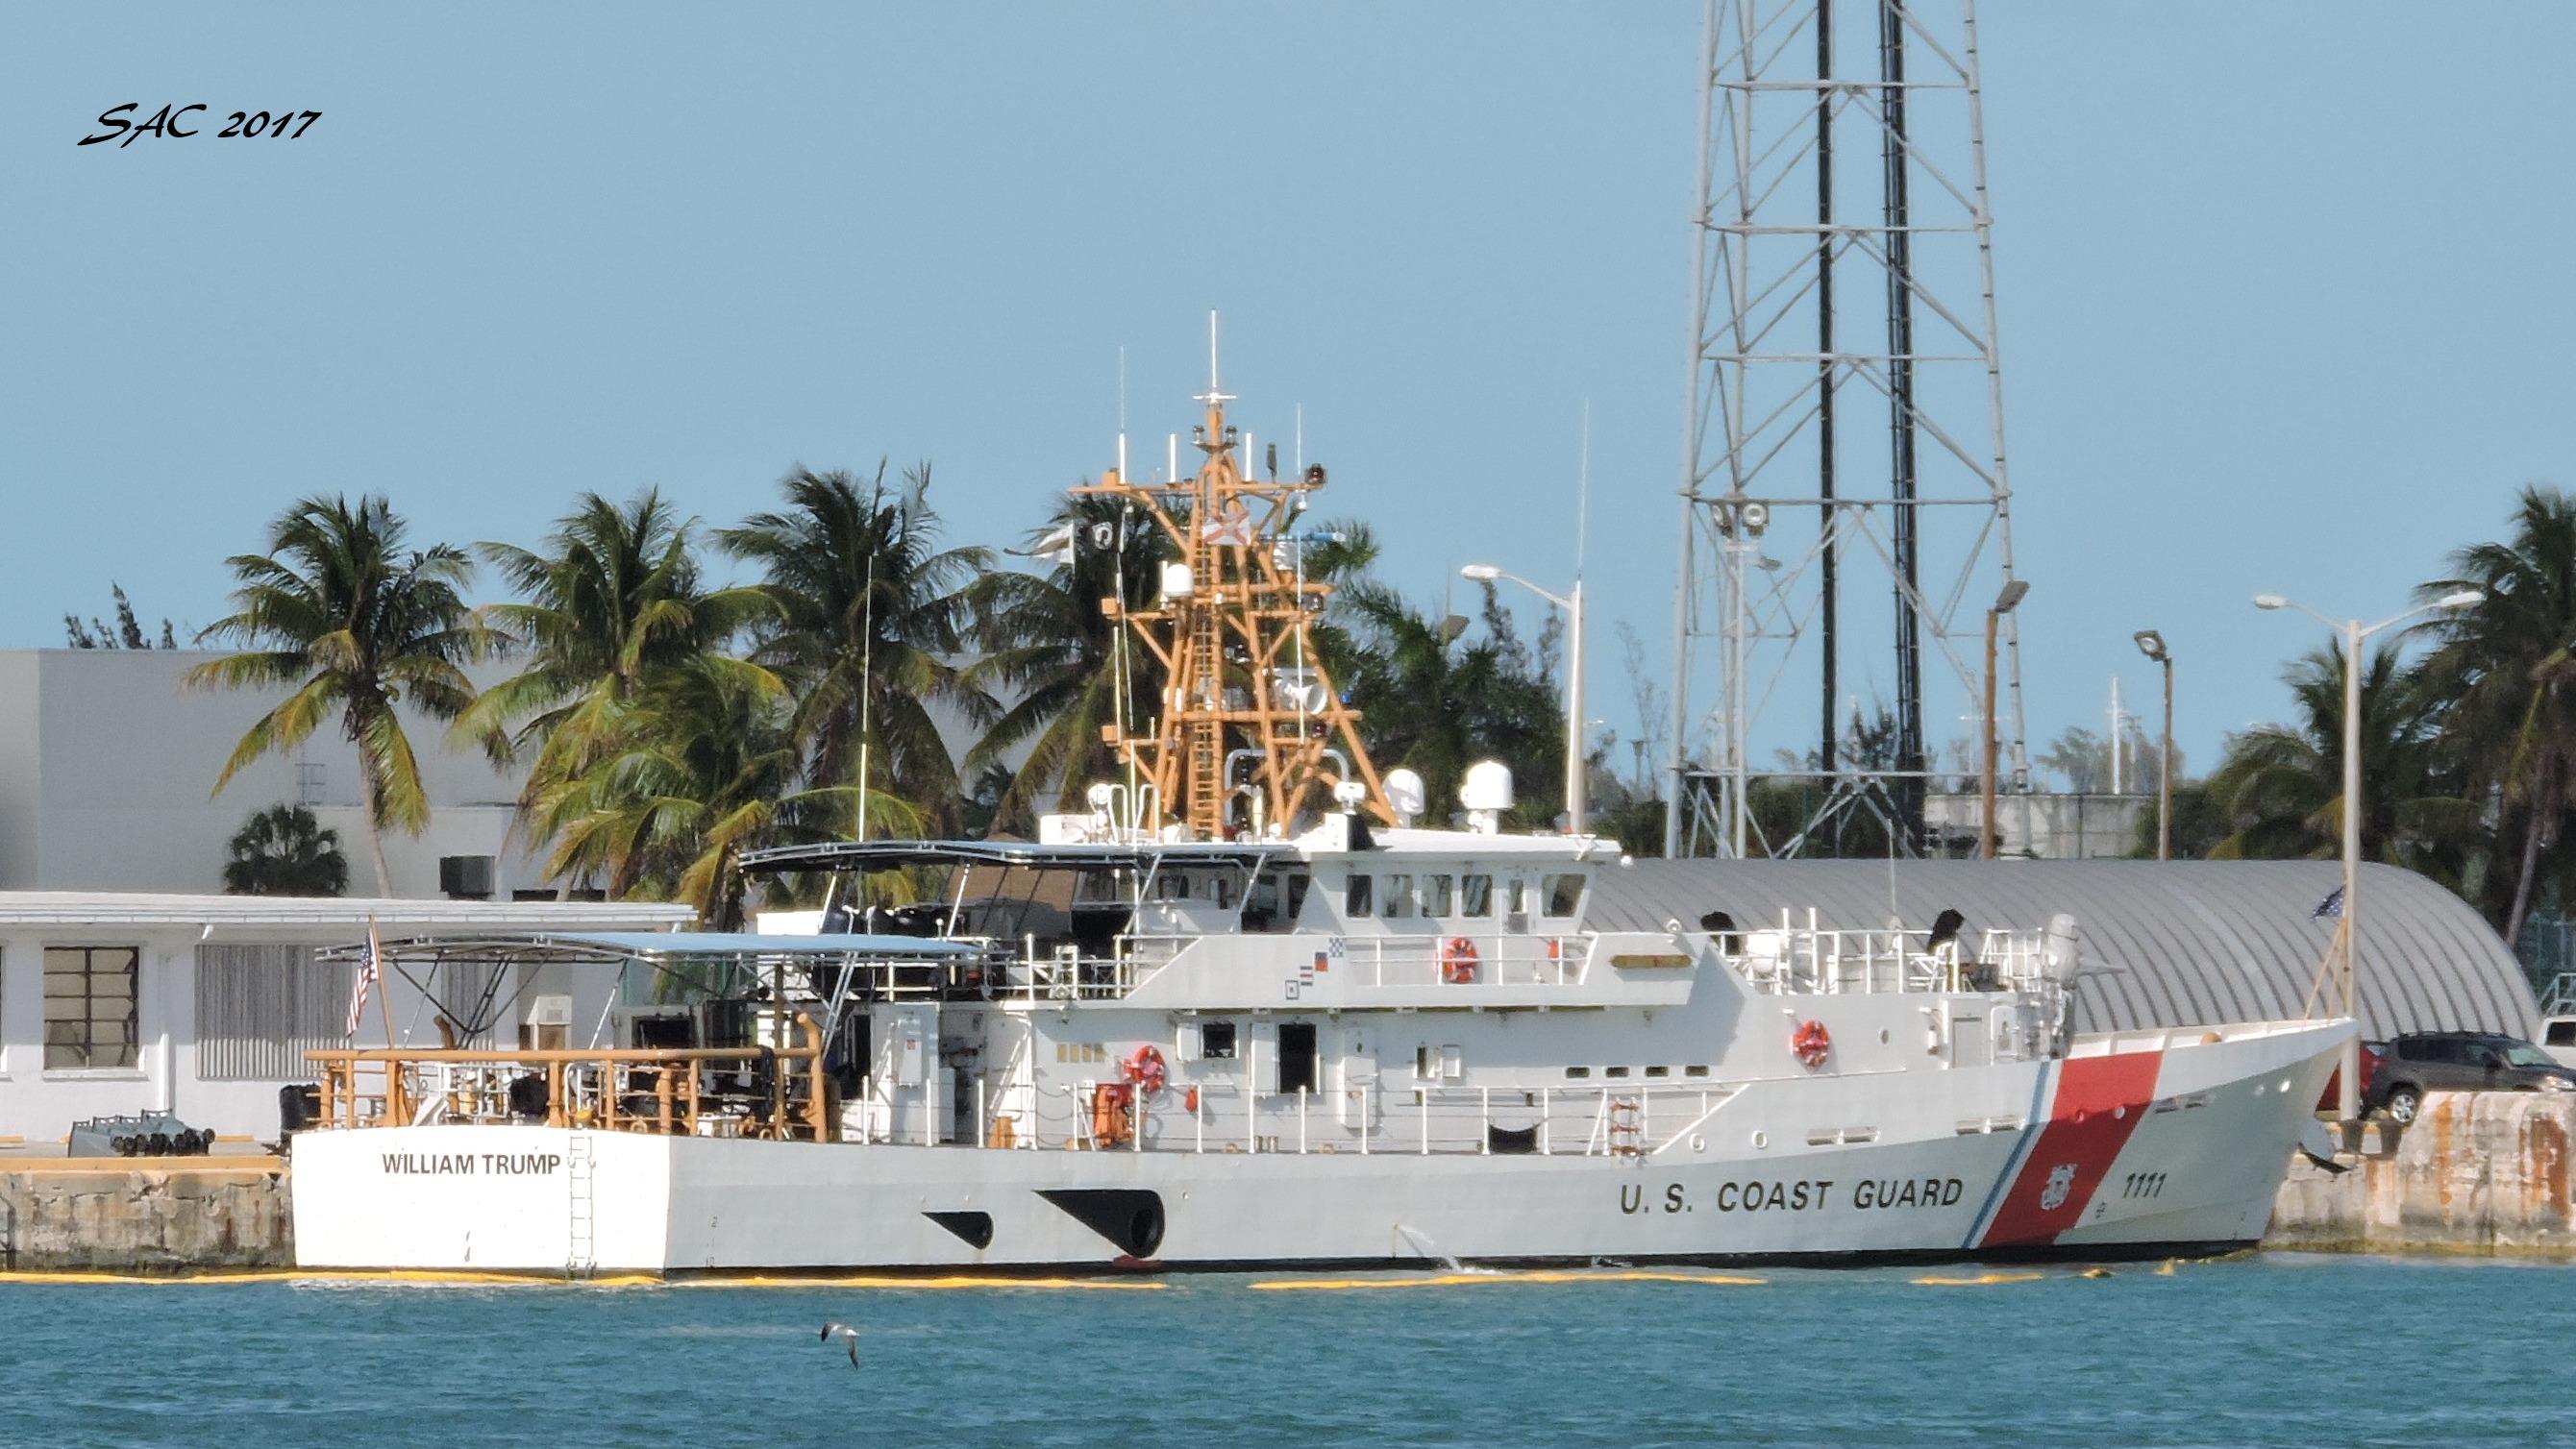 U. S. Coast Guard (garde-côtes des États-Unis) 2646578